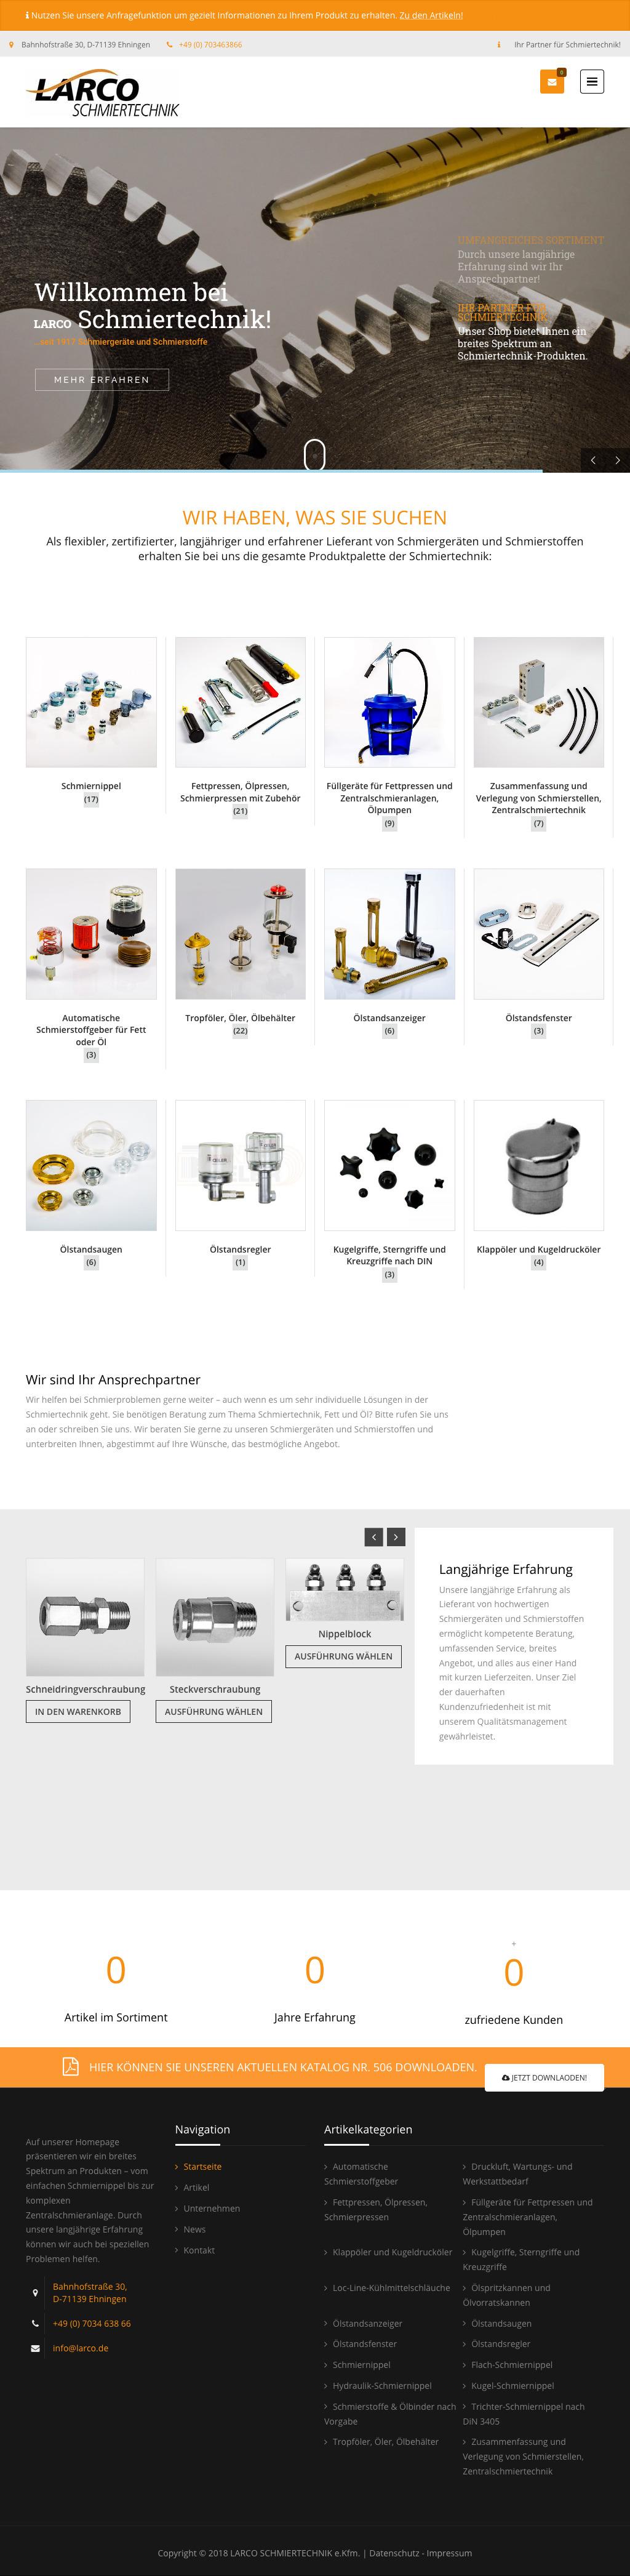 Webdesign Industrie Shop Tablet Ansicht